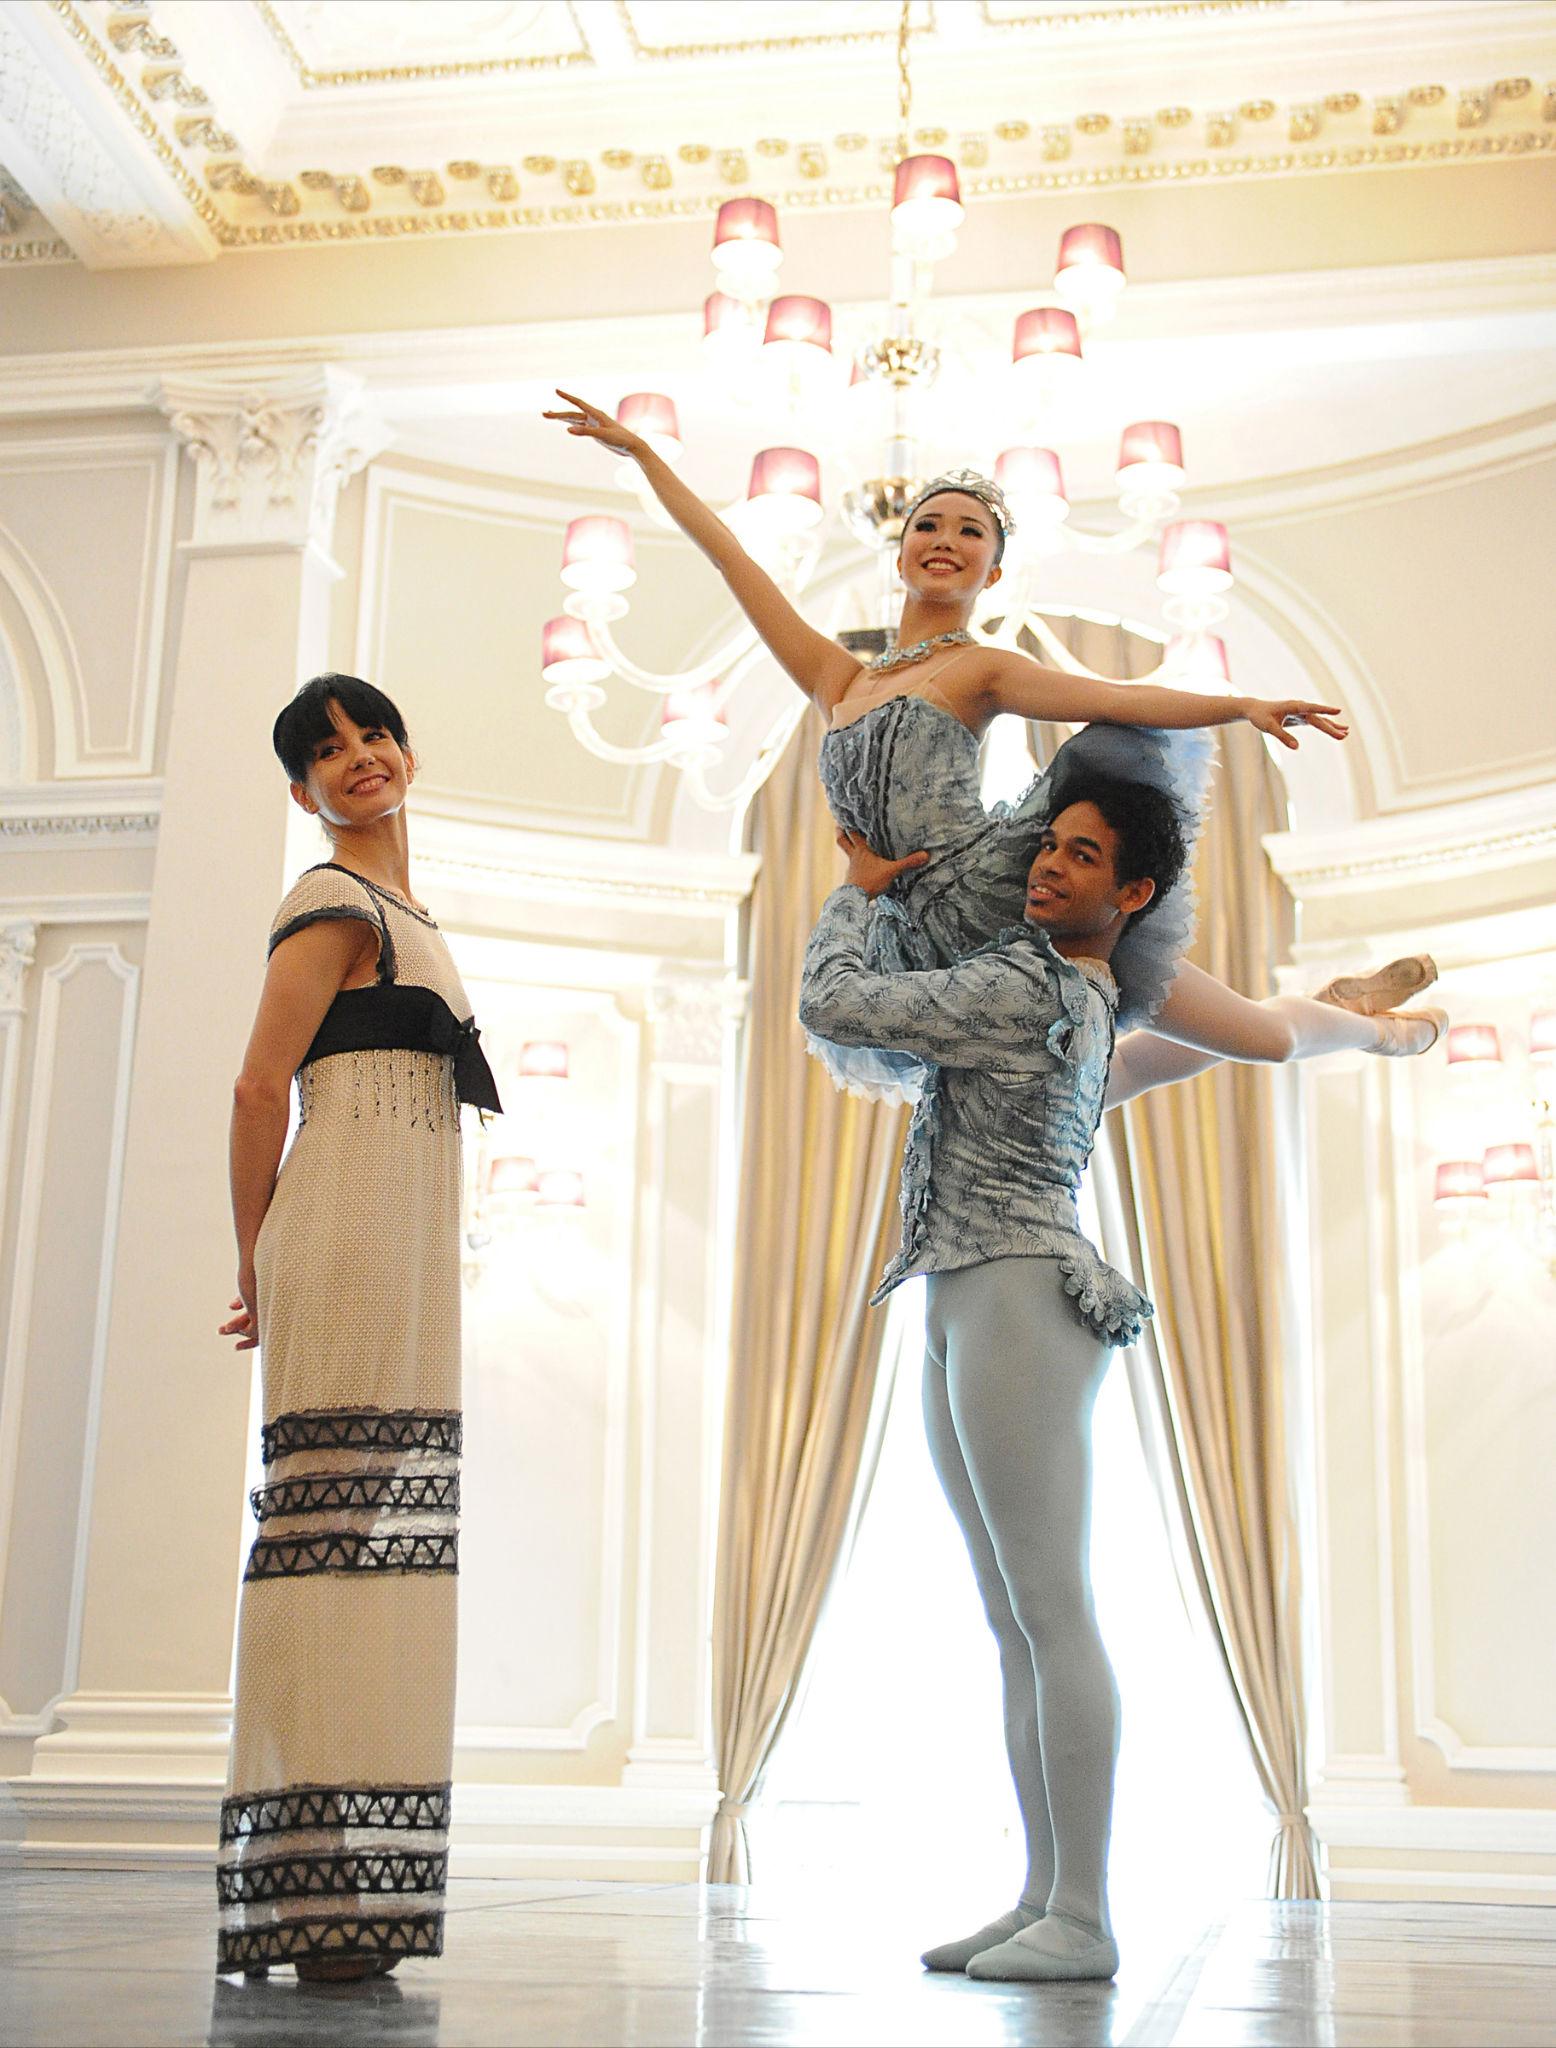 Tamara Rojo, Artistic Director of English National Ballet, with dancers Yonah Acosta and Shiori Kase